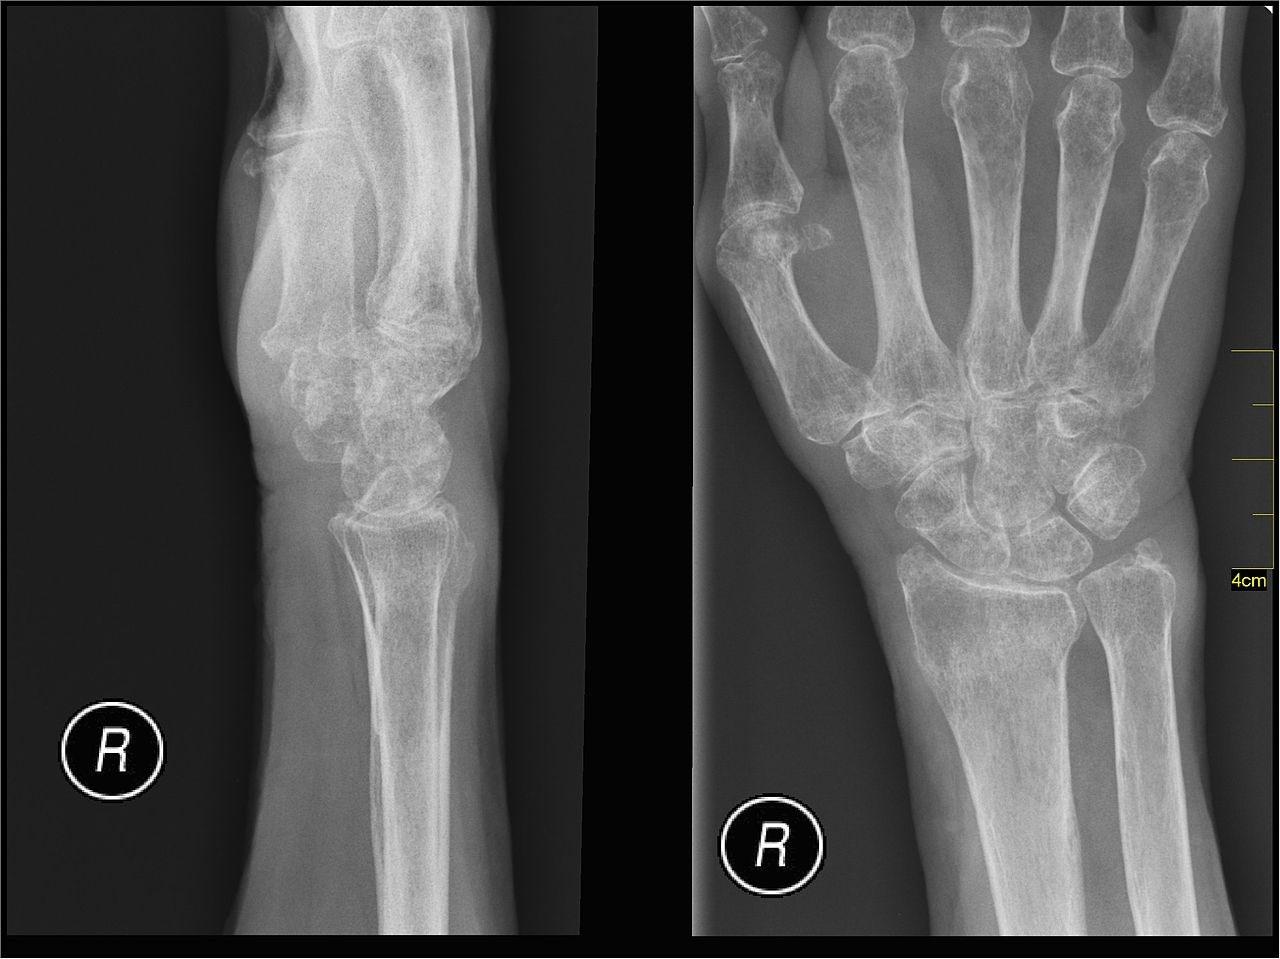 Postmenopause Osteoporosis Drug Denosumab Demonstrates Long-term Safety